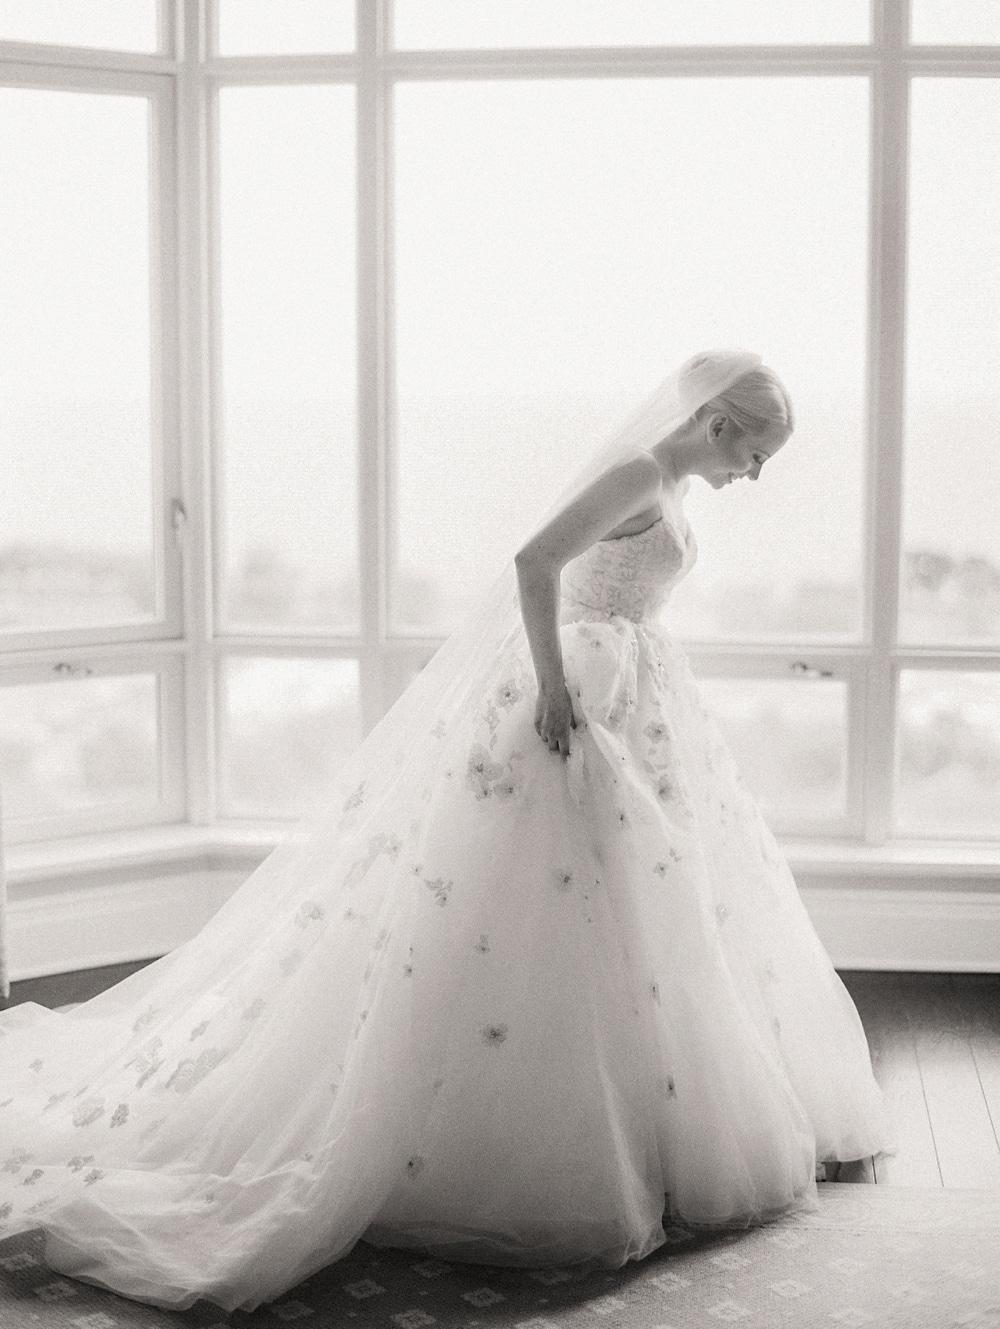 Kristin-La-Voie-Photography-salvatore's-chicago-wedding-photographer-108